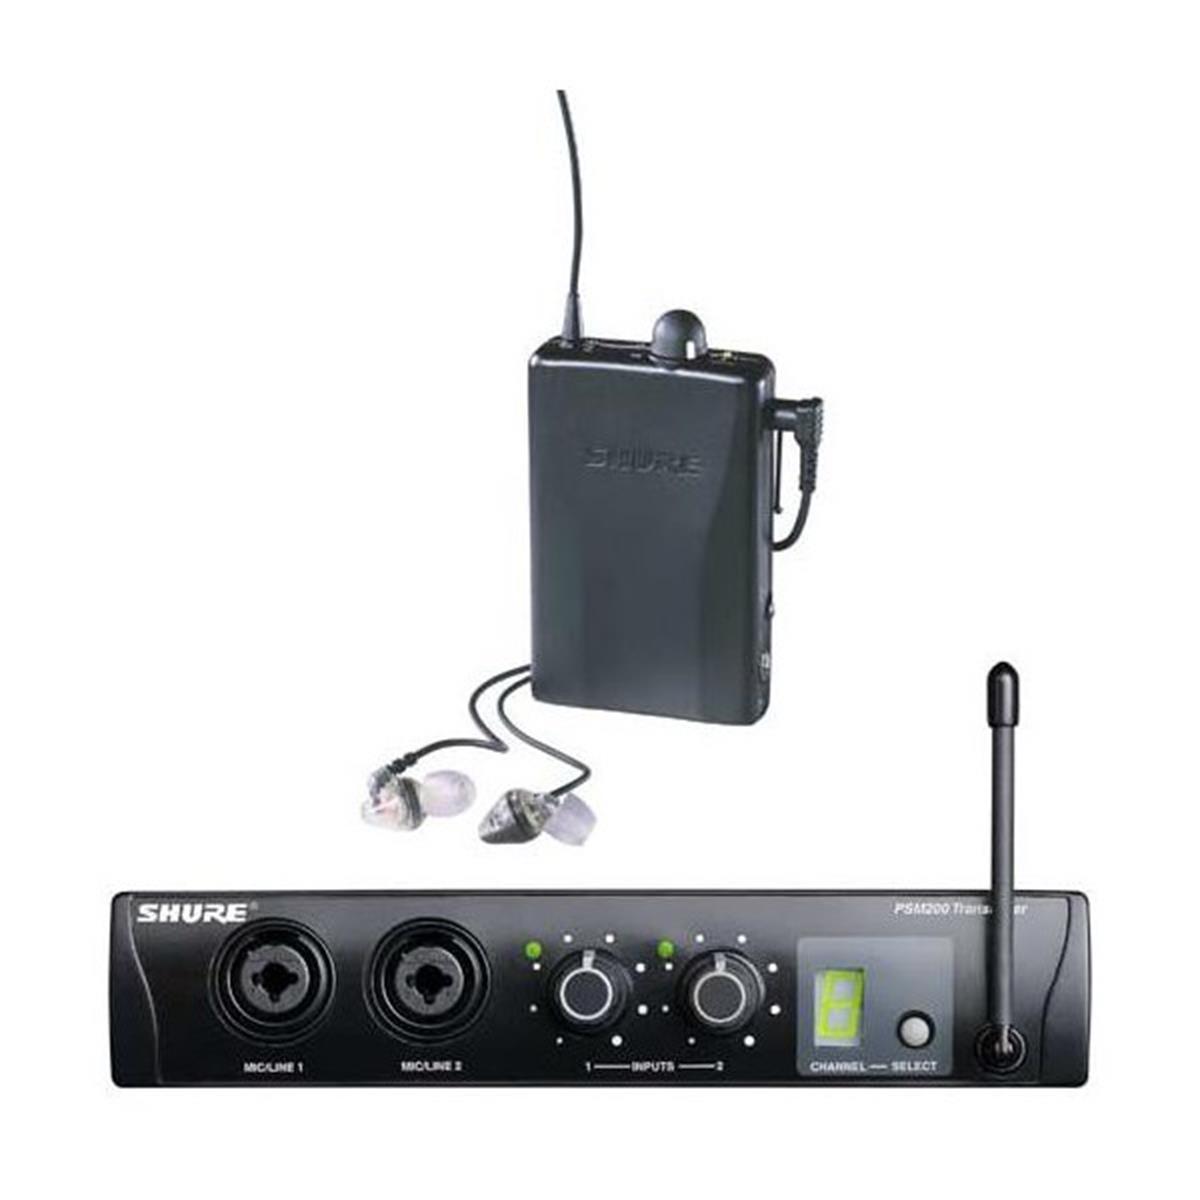 SHURE PSM200 P2TR112GR SISTEMA EAR MONITOR CON CUFFIE